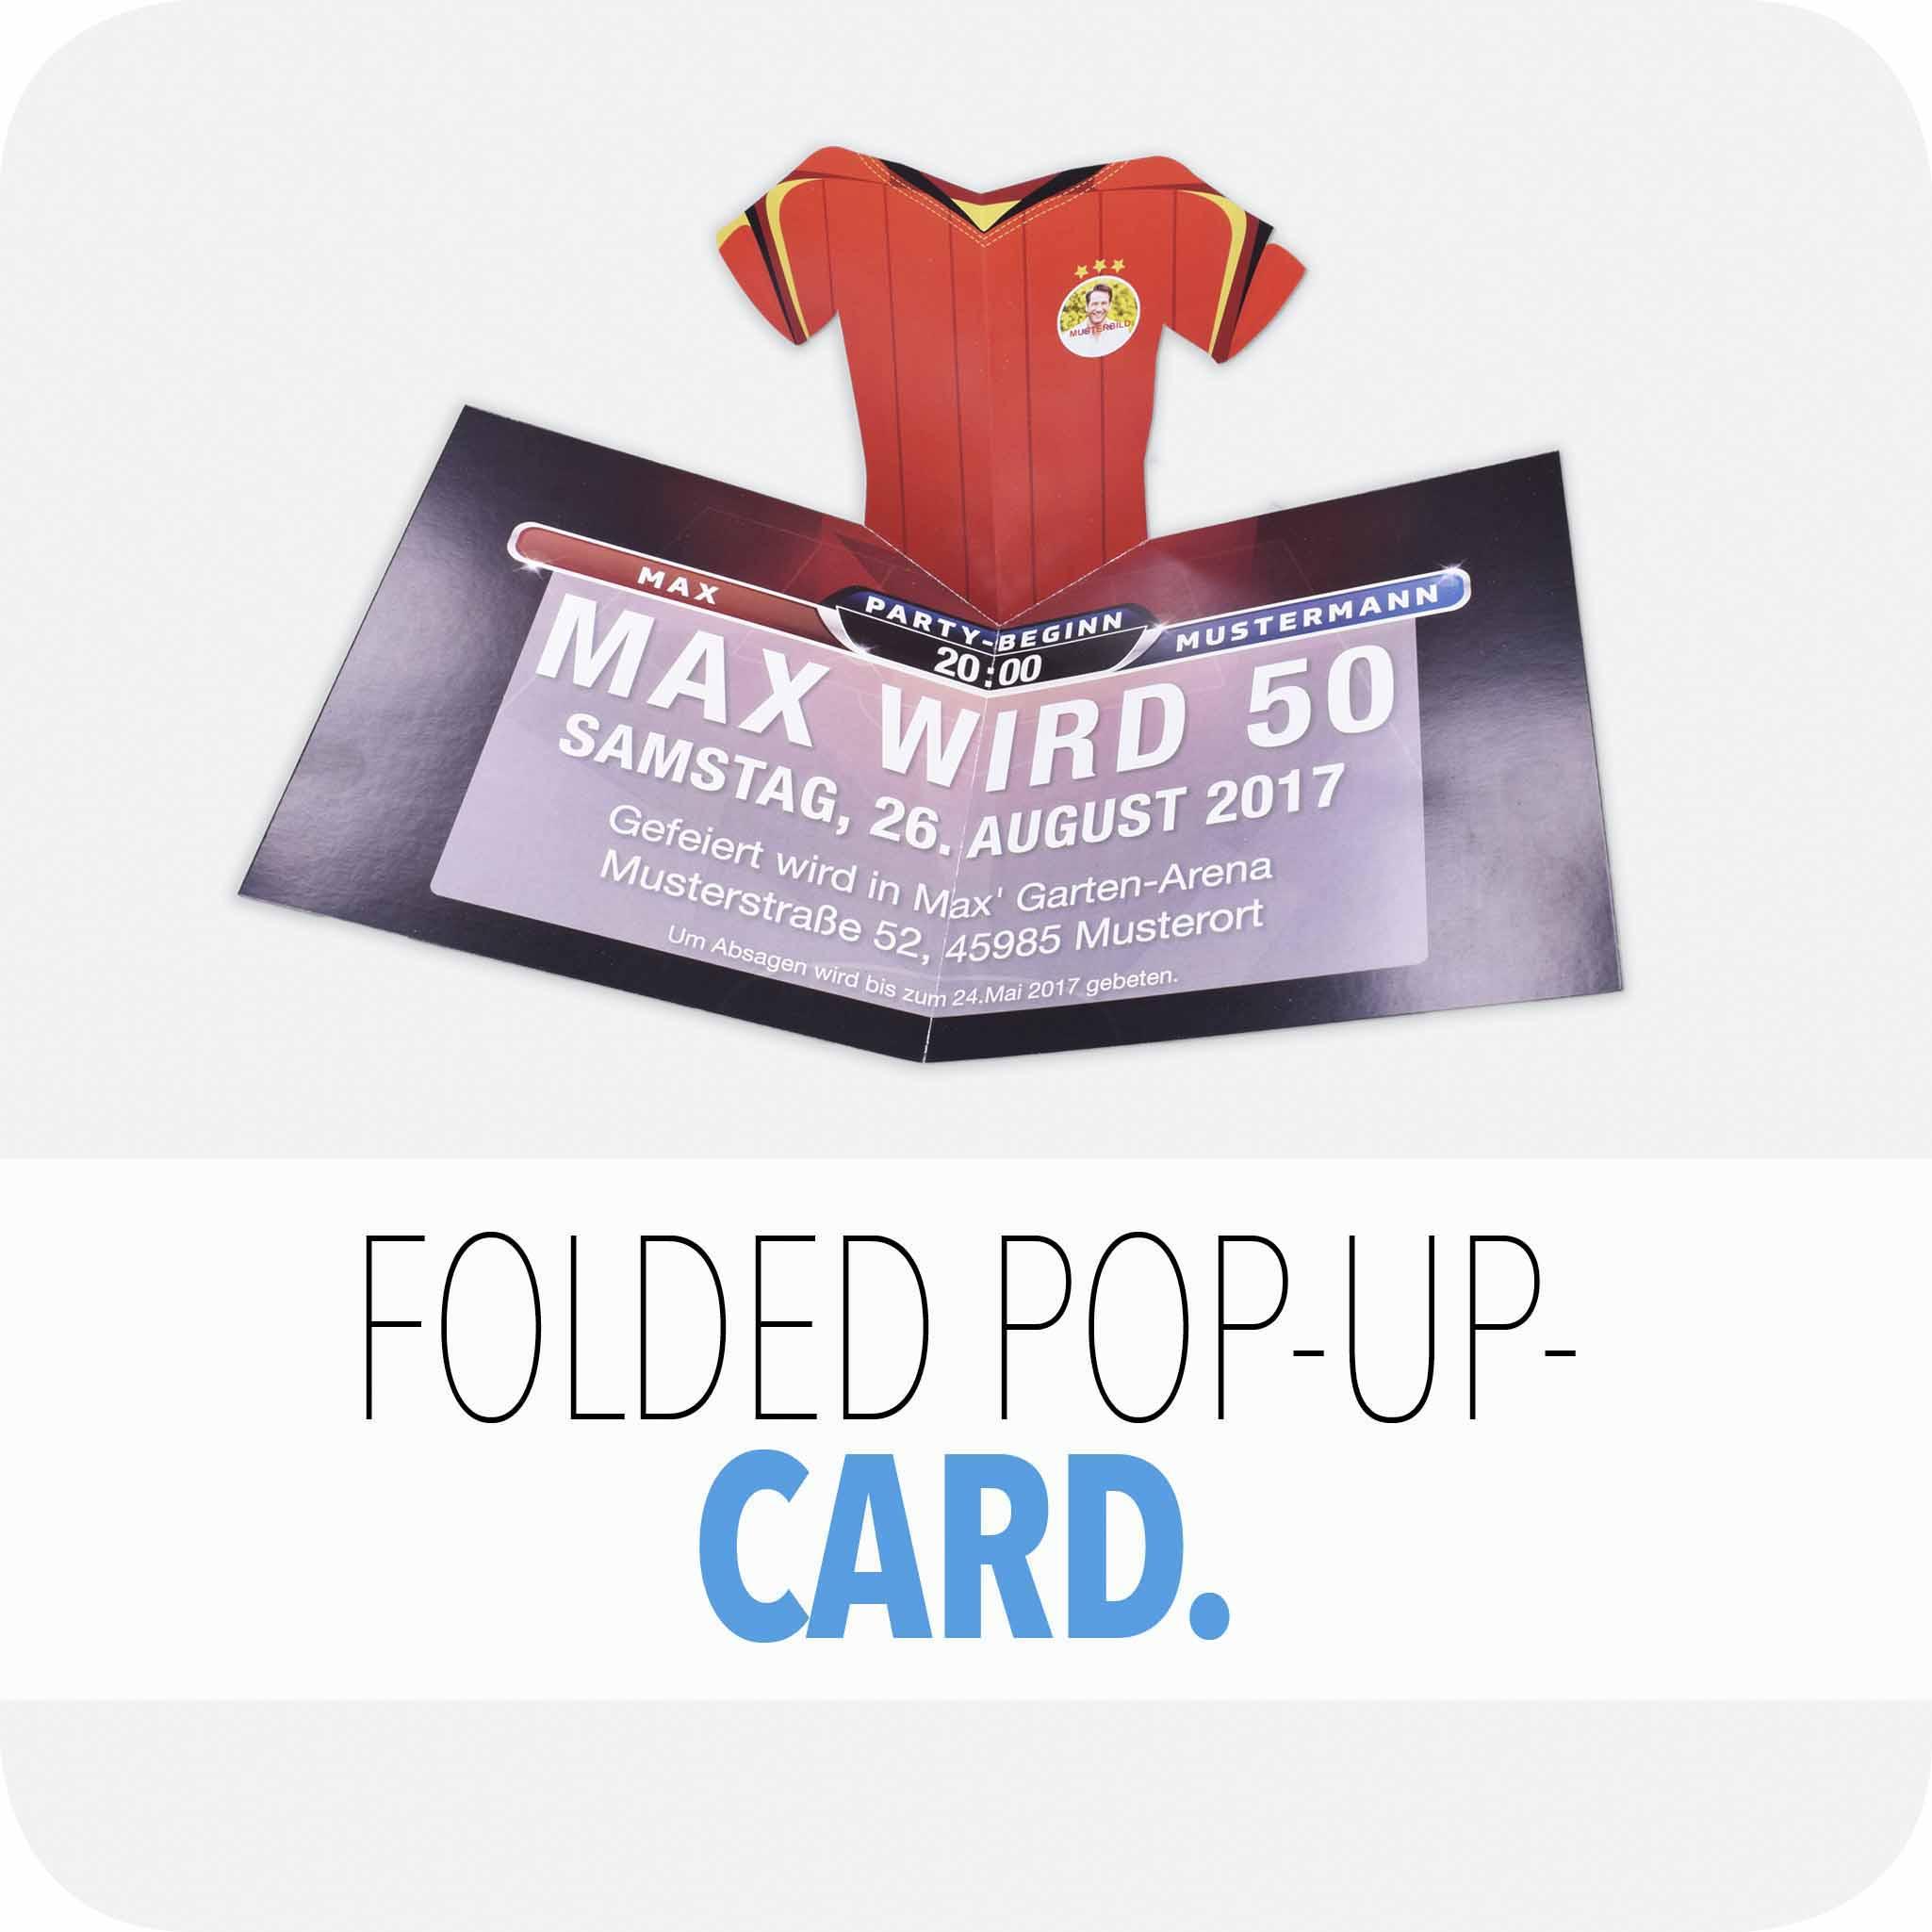 Fold-pop-up card